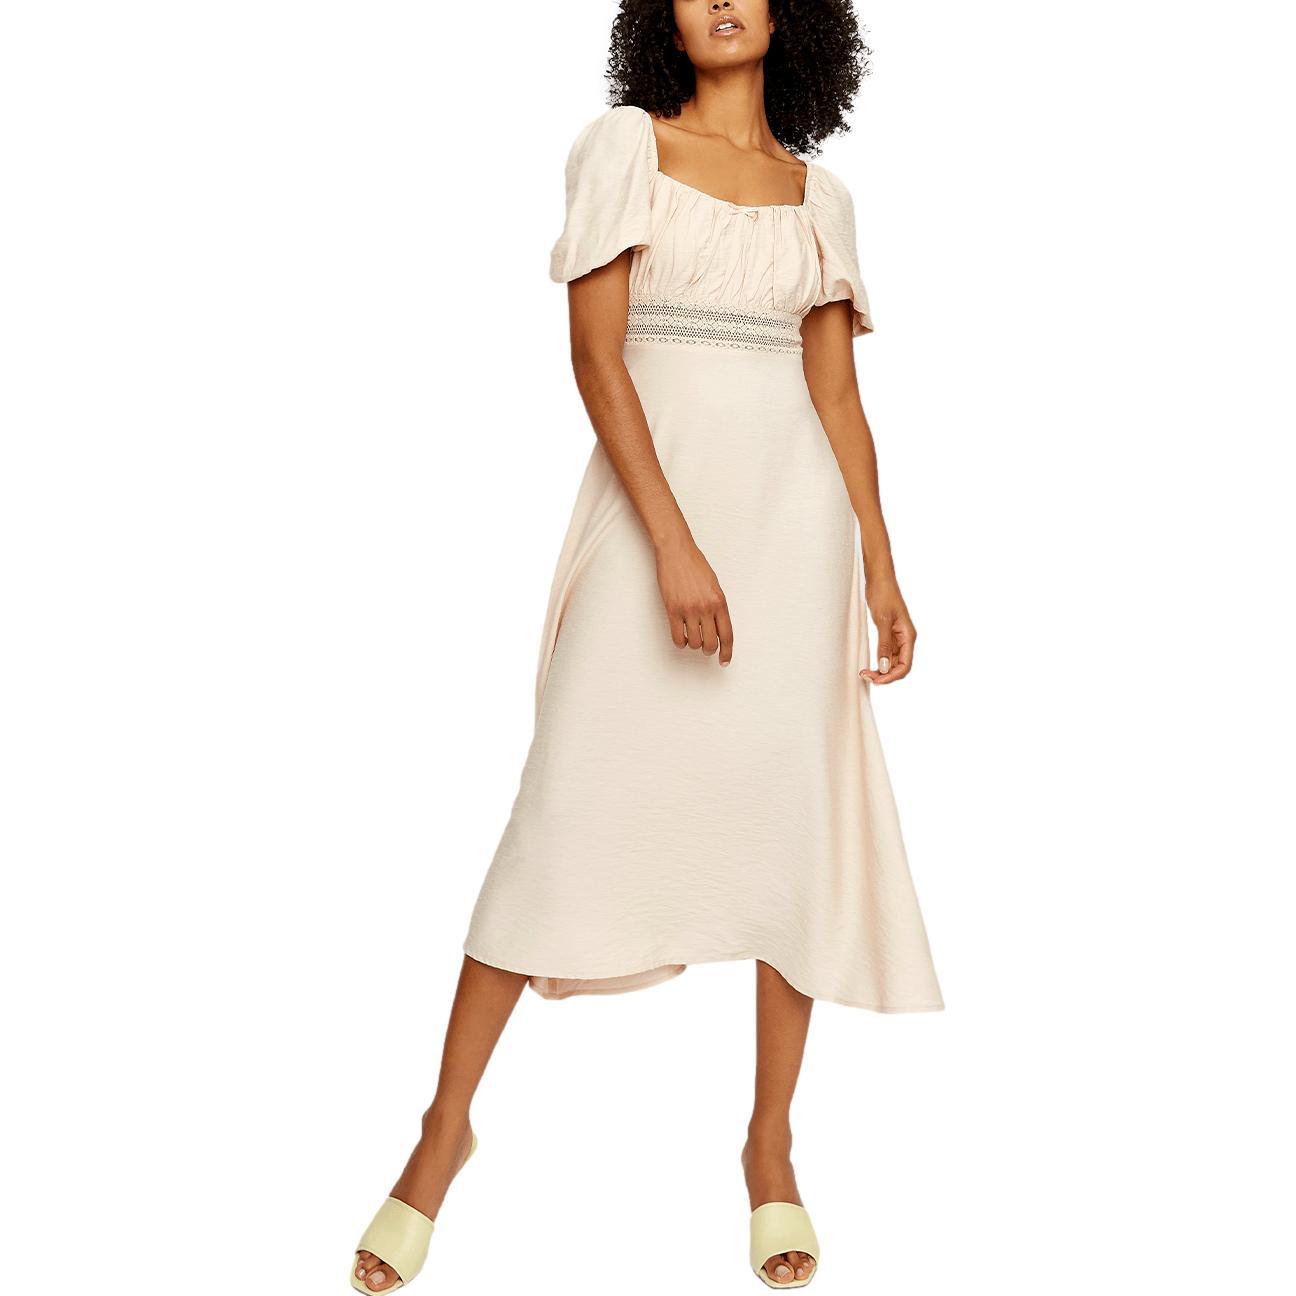 LINEN UK GLAMOOUS DRESS GLAMOROUS      AN3929NUDE